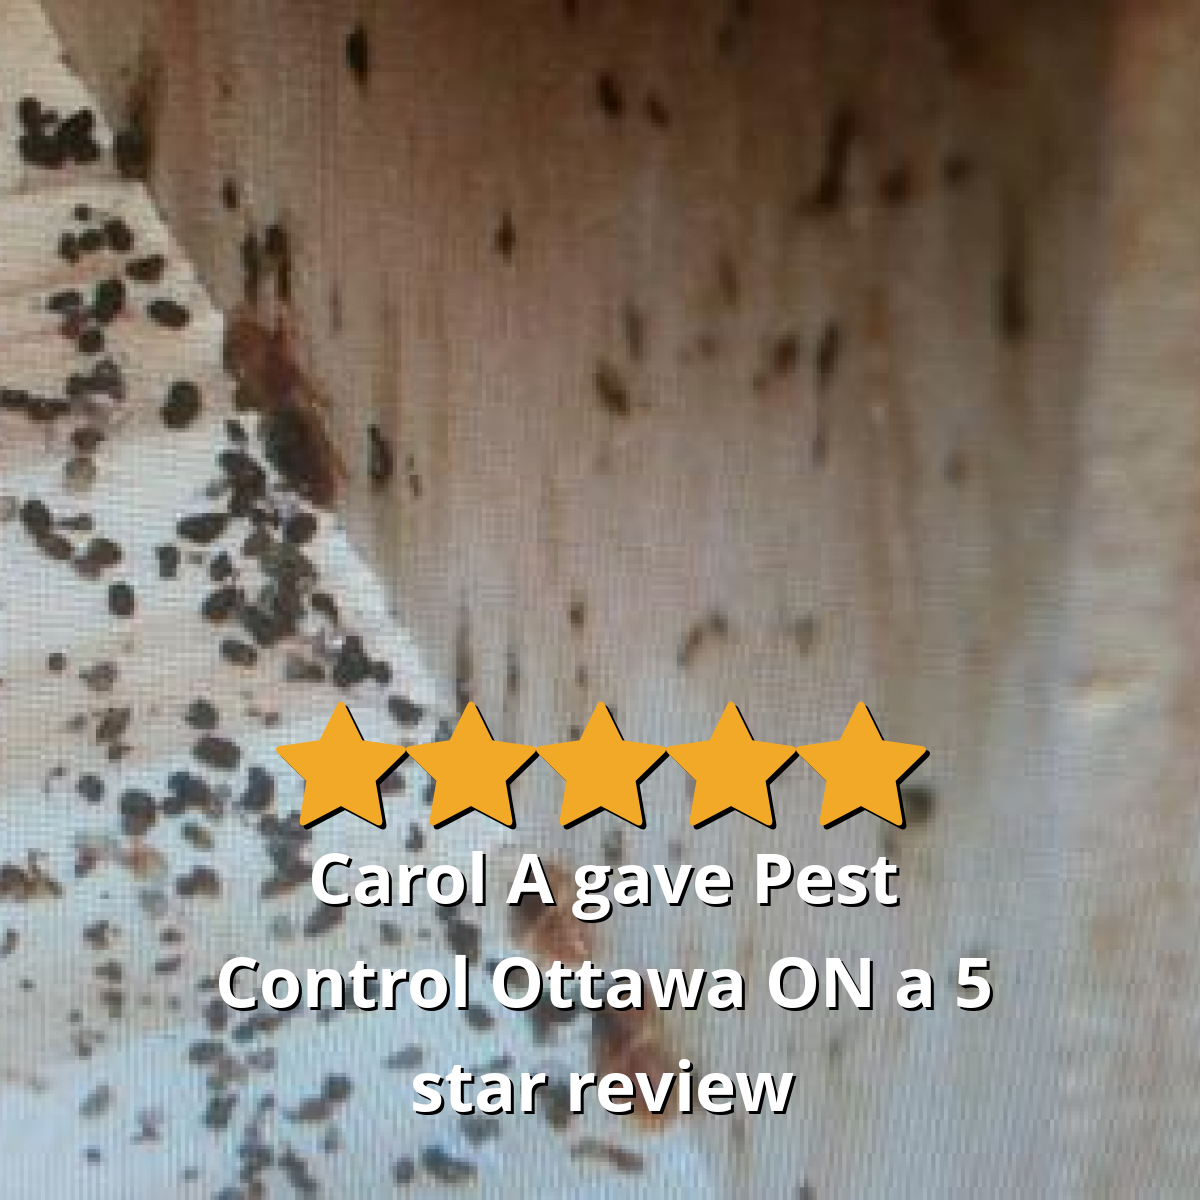 Carol A gave Pest Control Ottawa Inc. a 5 star review